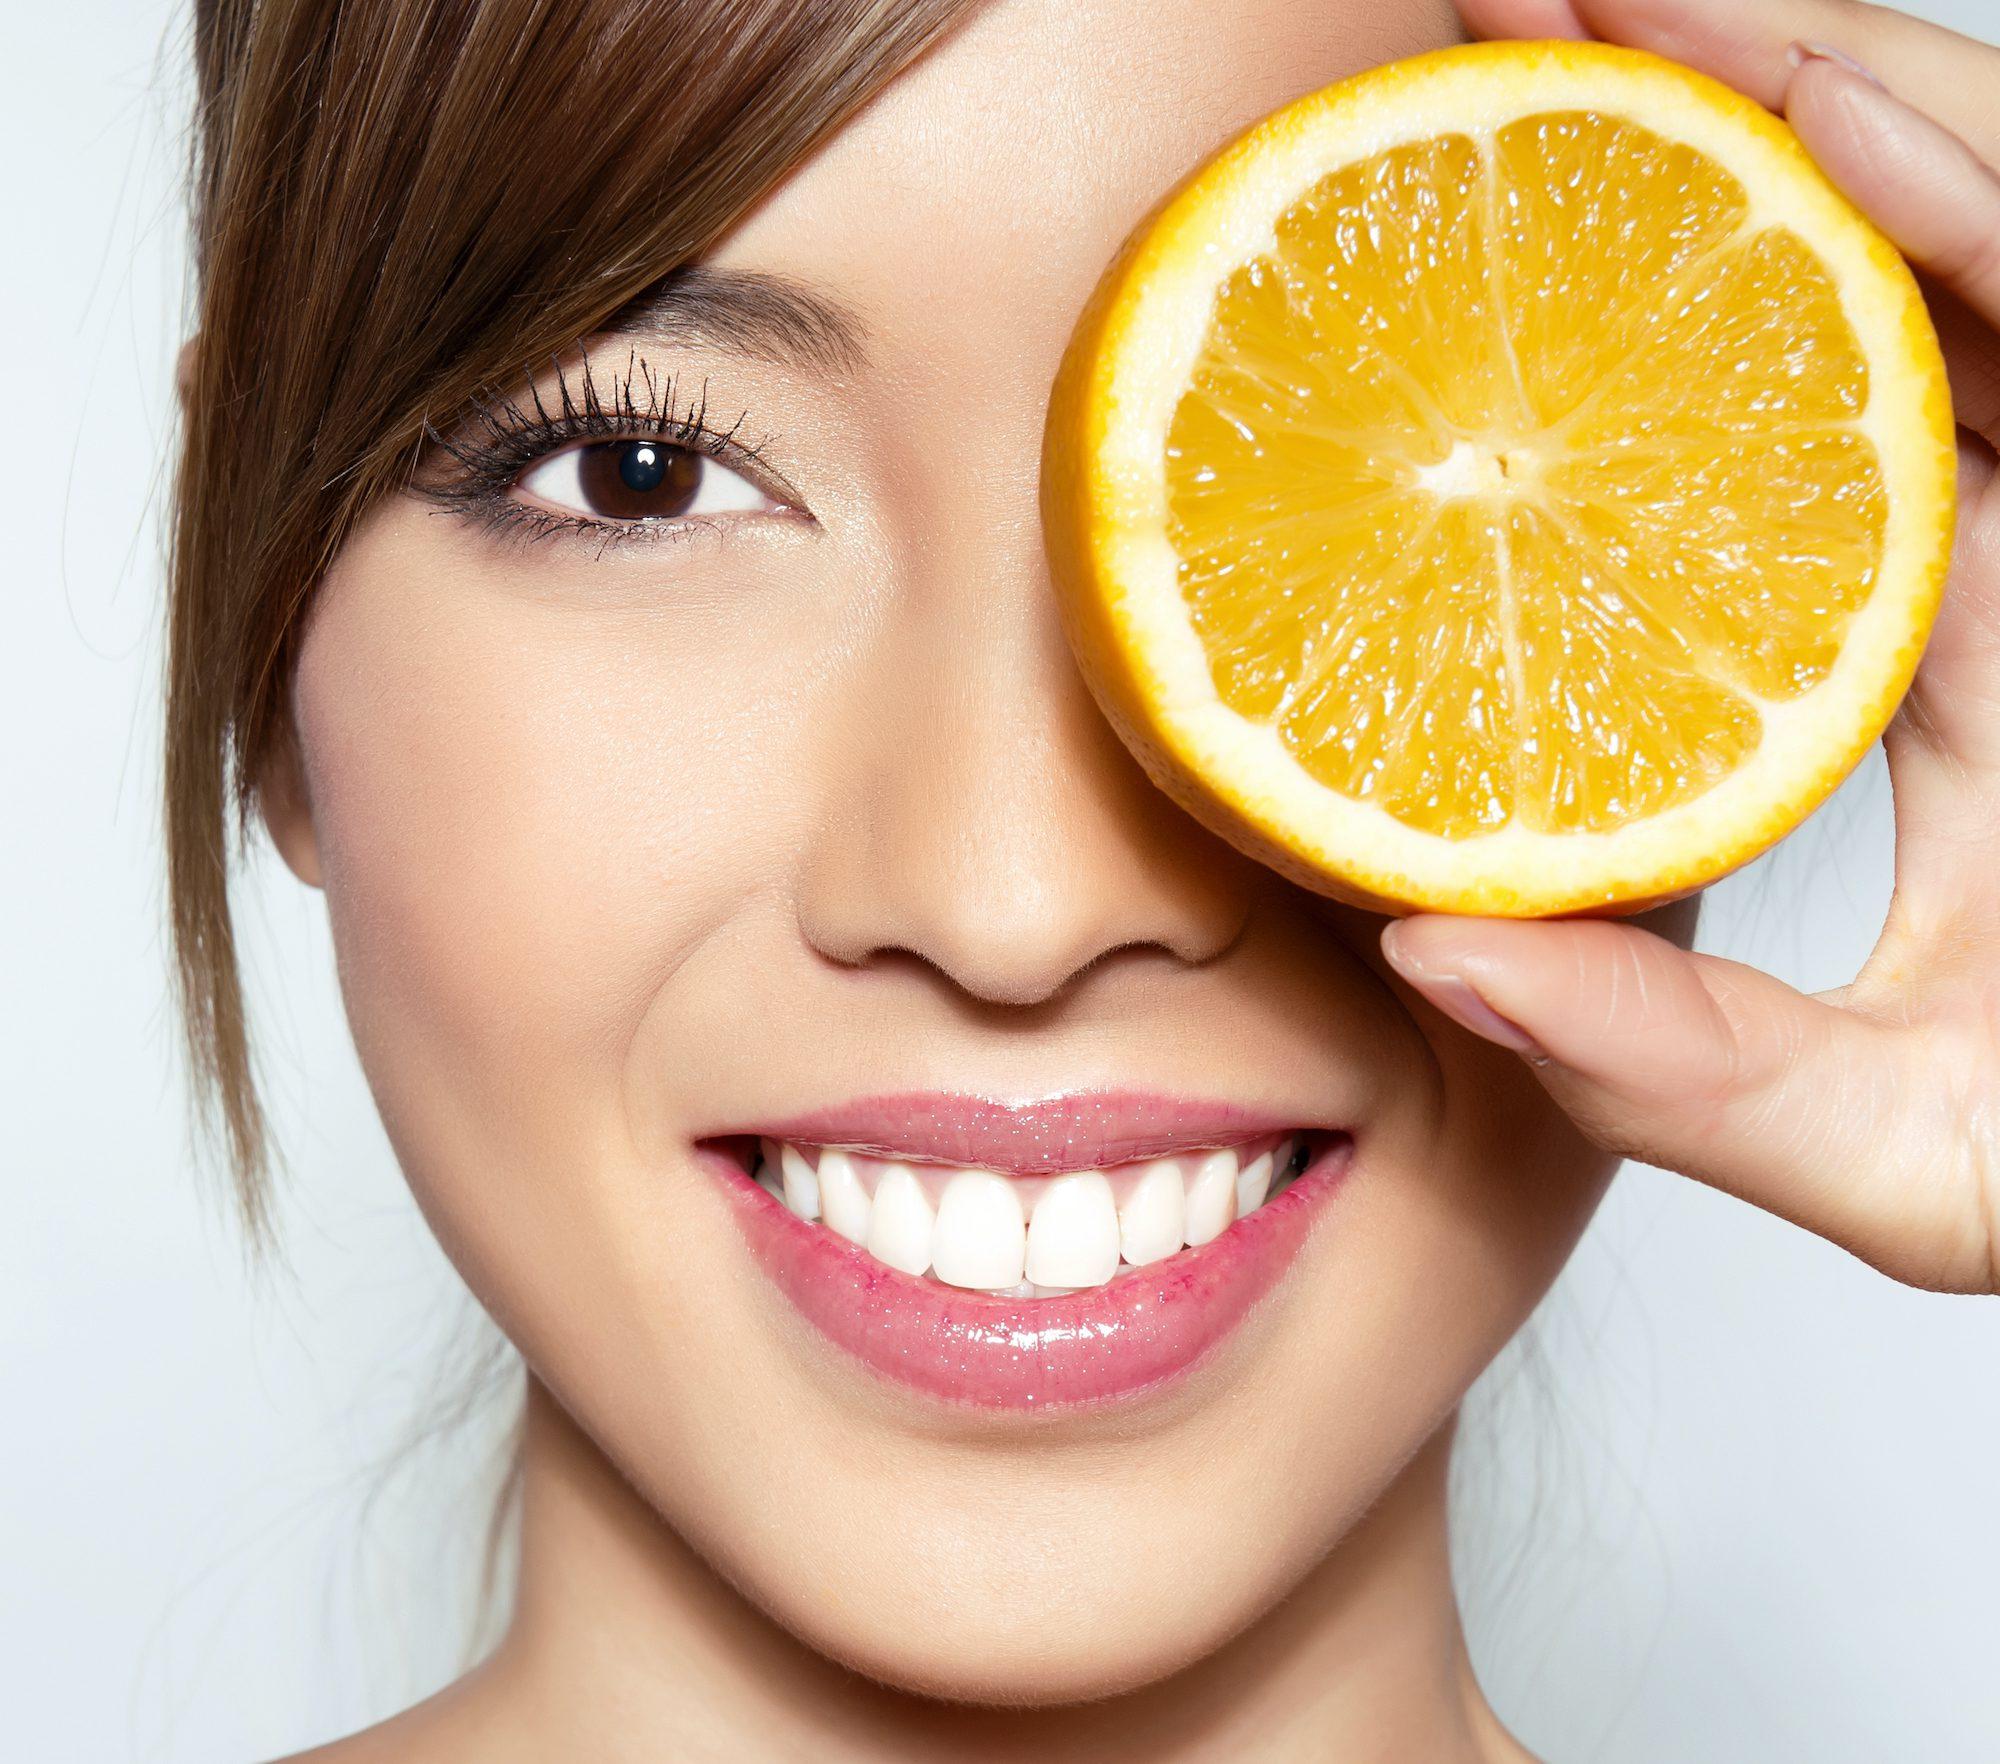 Vitamin C creams and serums